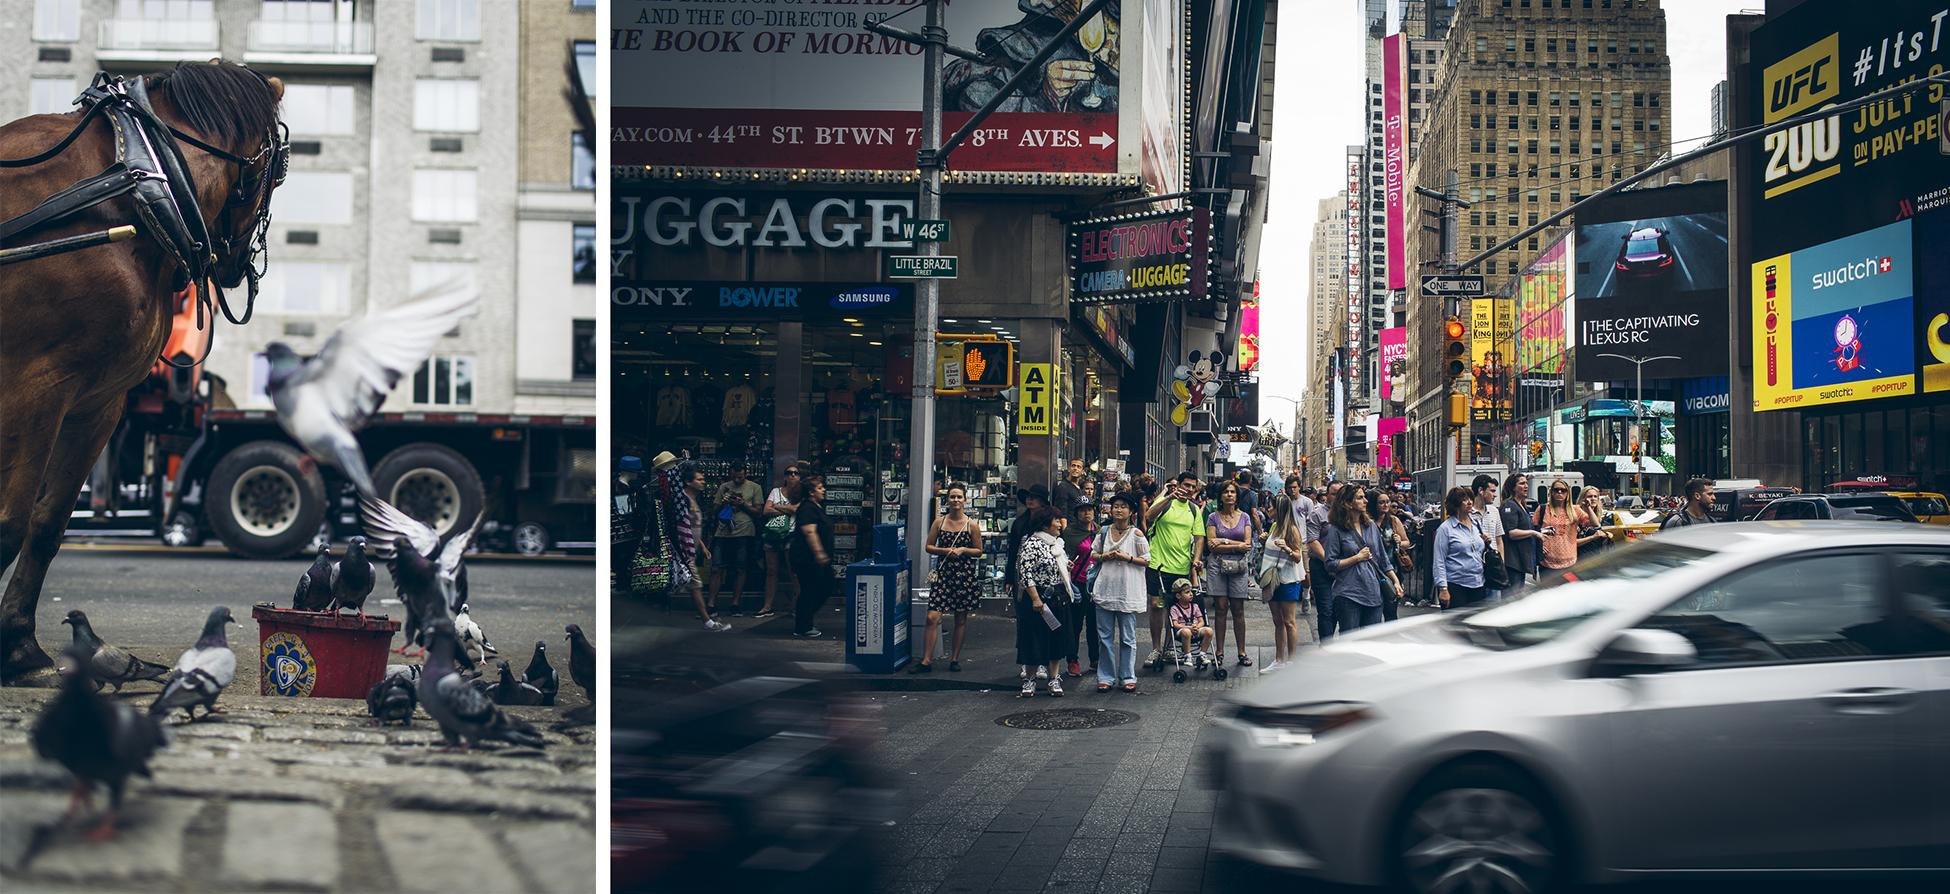 desktoglory_newyork-9 copy